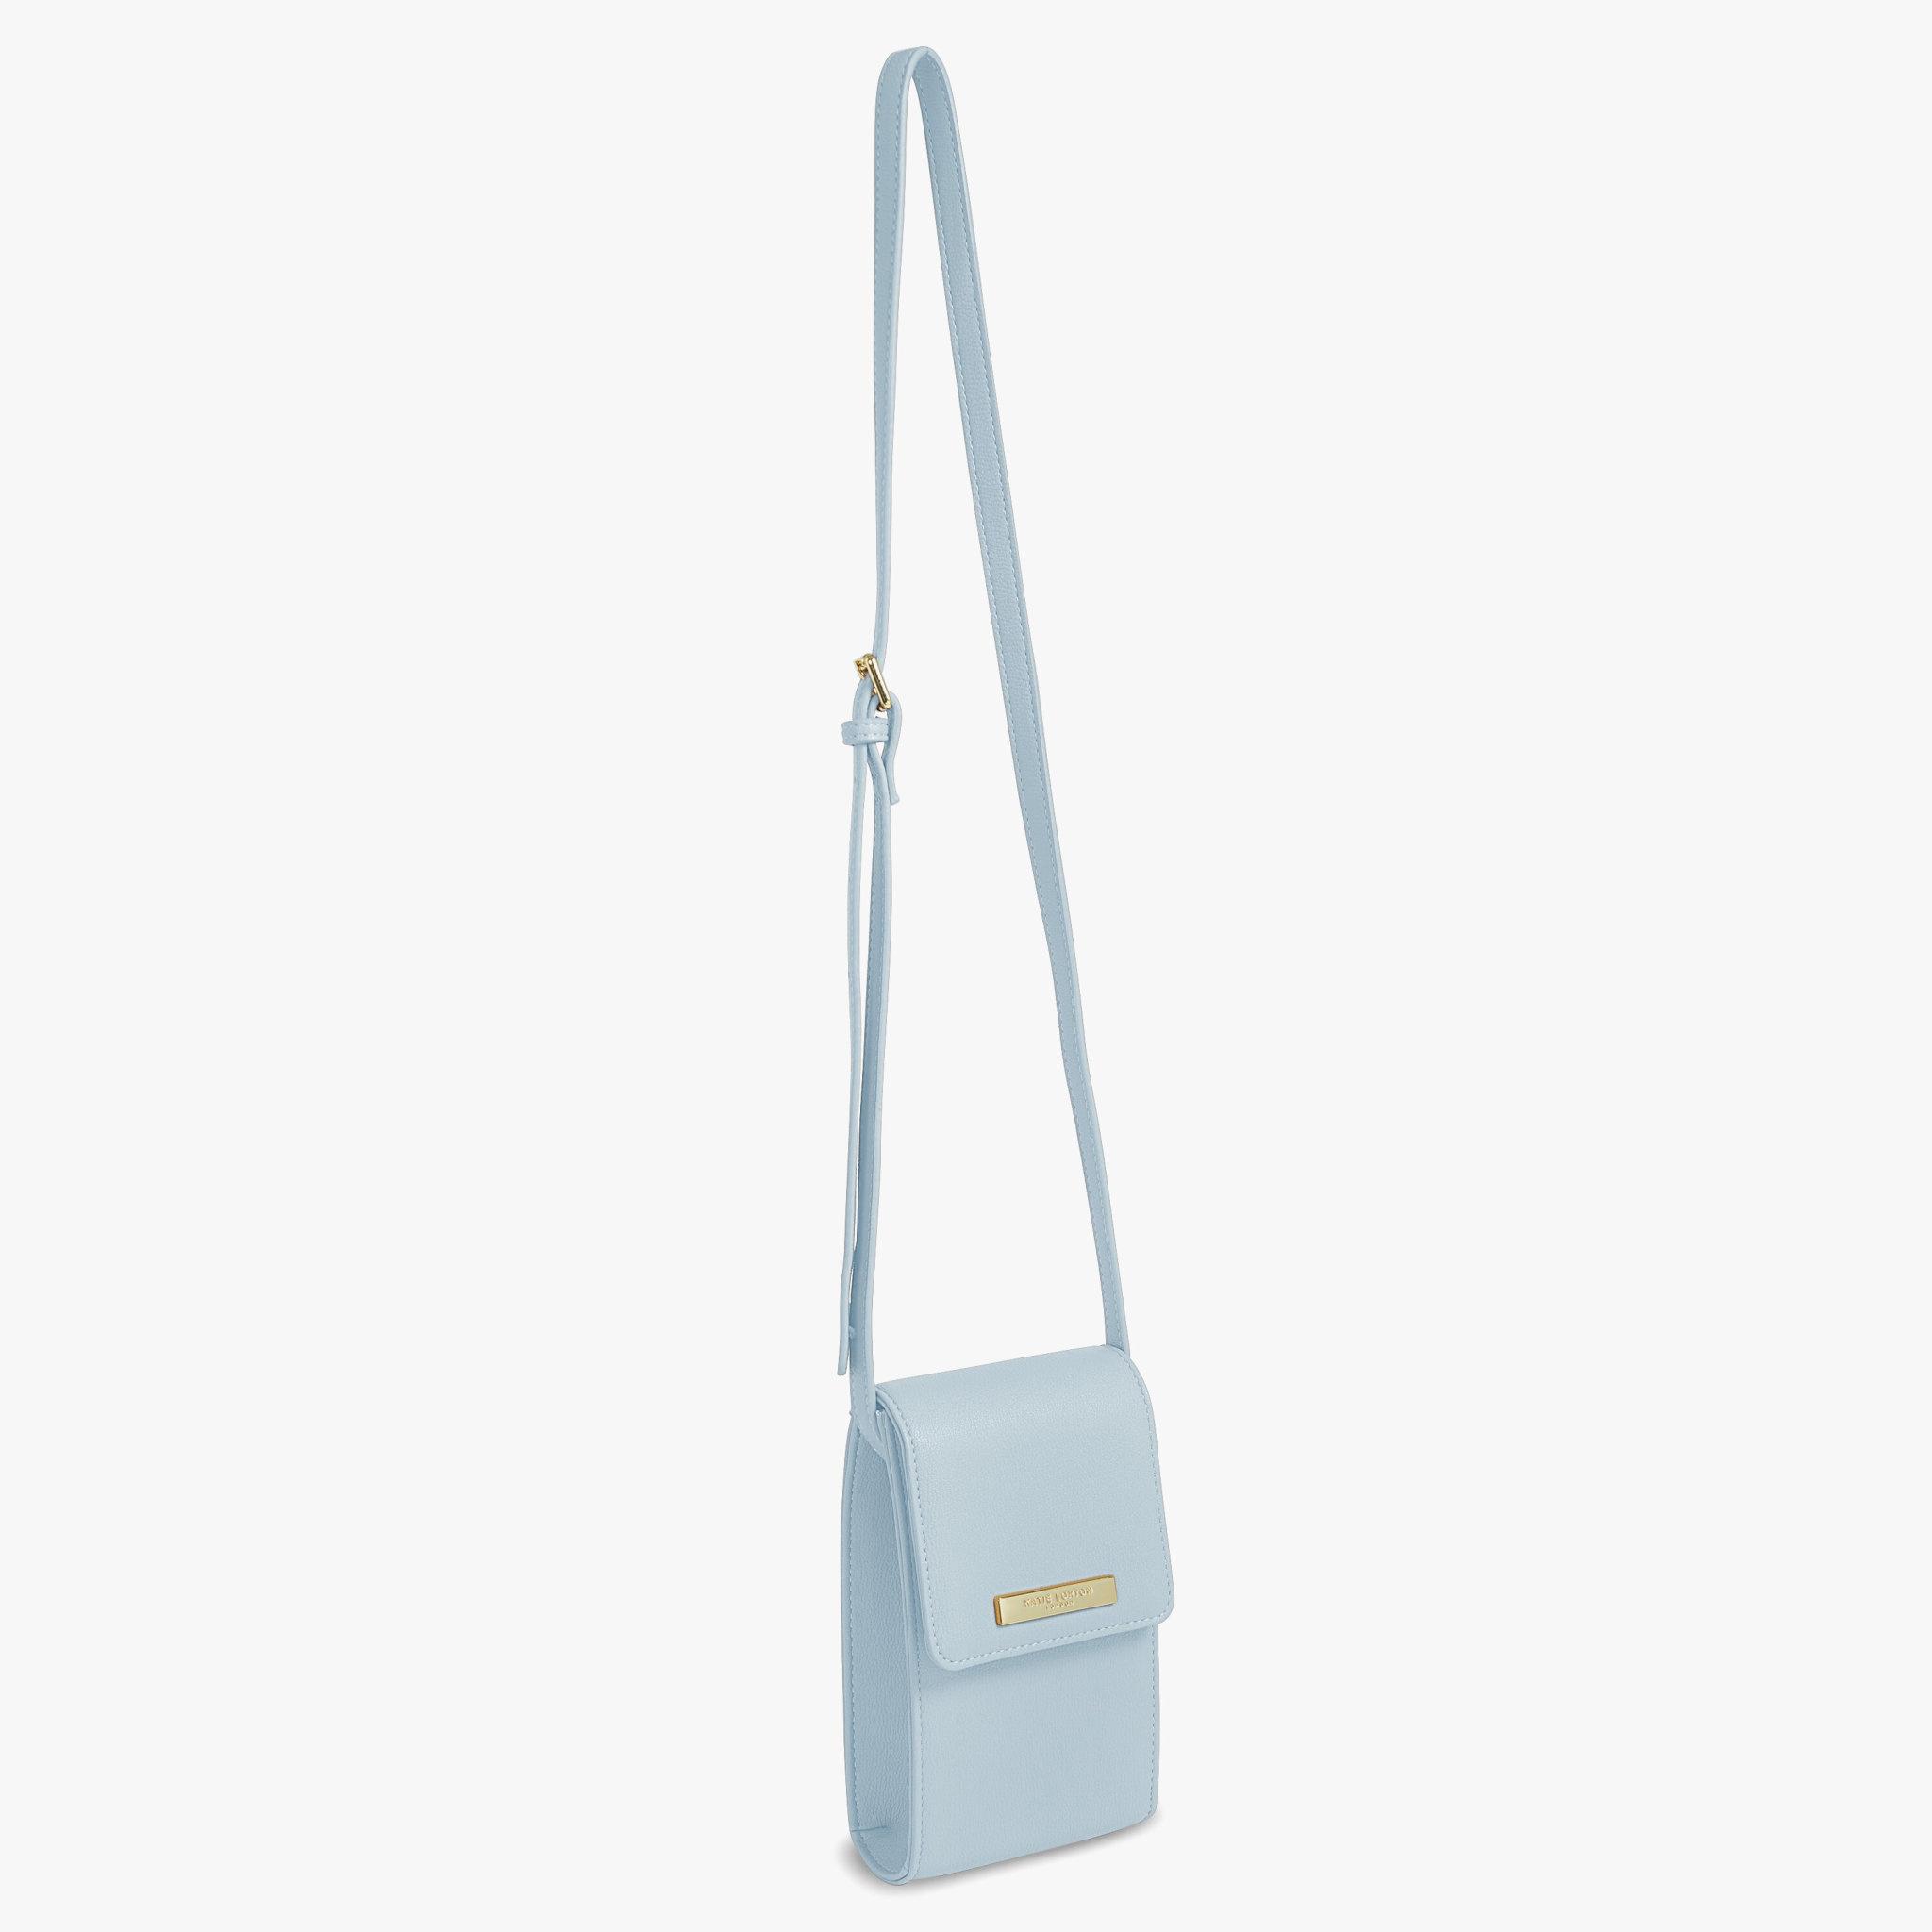 Katie Loxton Katie Loxton Taylor corssbody bag - Pale blue - 18.5 x 10.5 x 4.5 cm